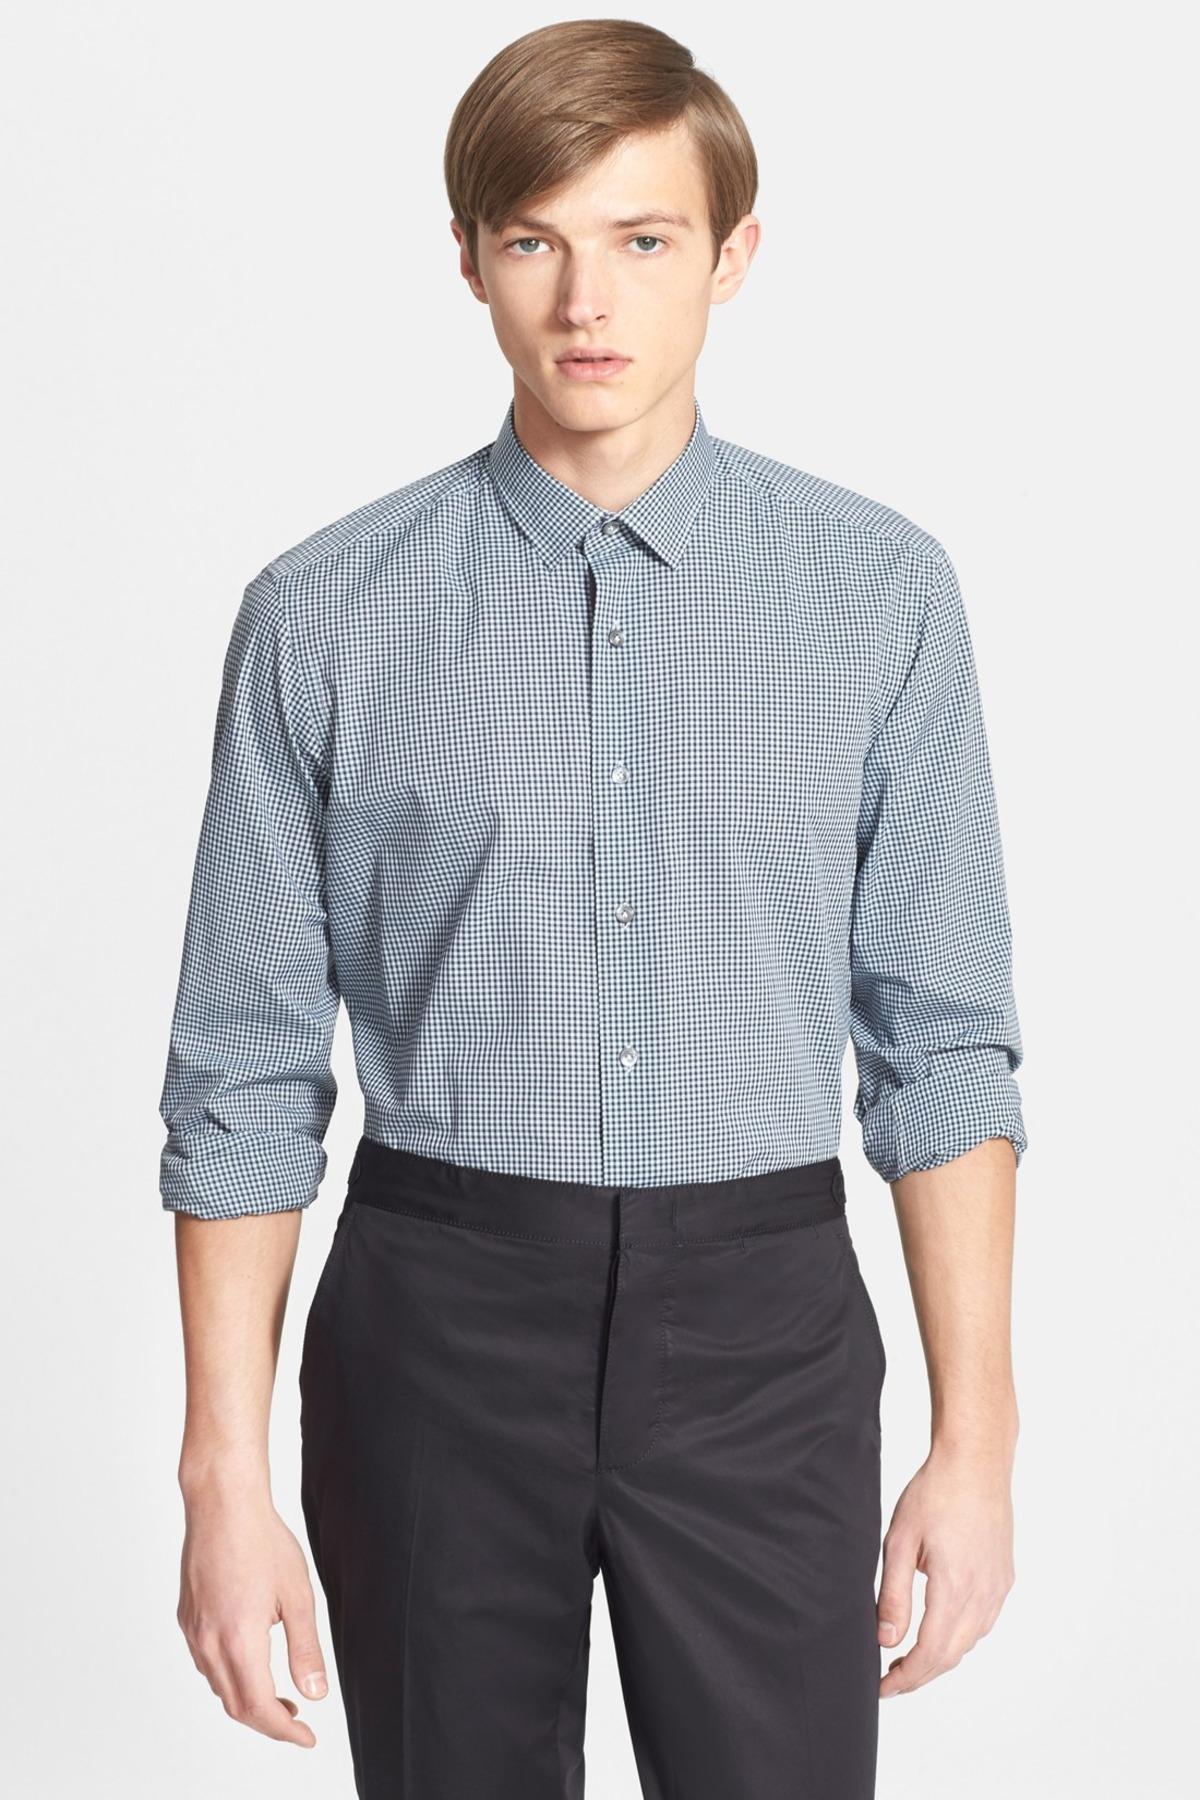 Lyst lanvin extra trim fit gingham dress shirt in blue for Gingham dress shirt men